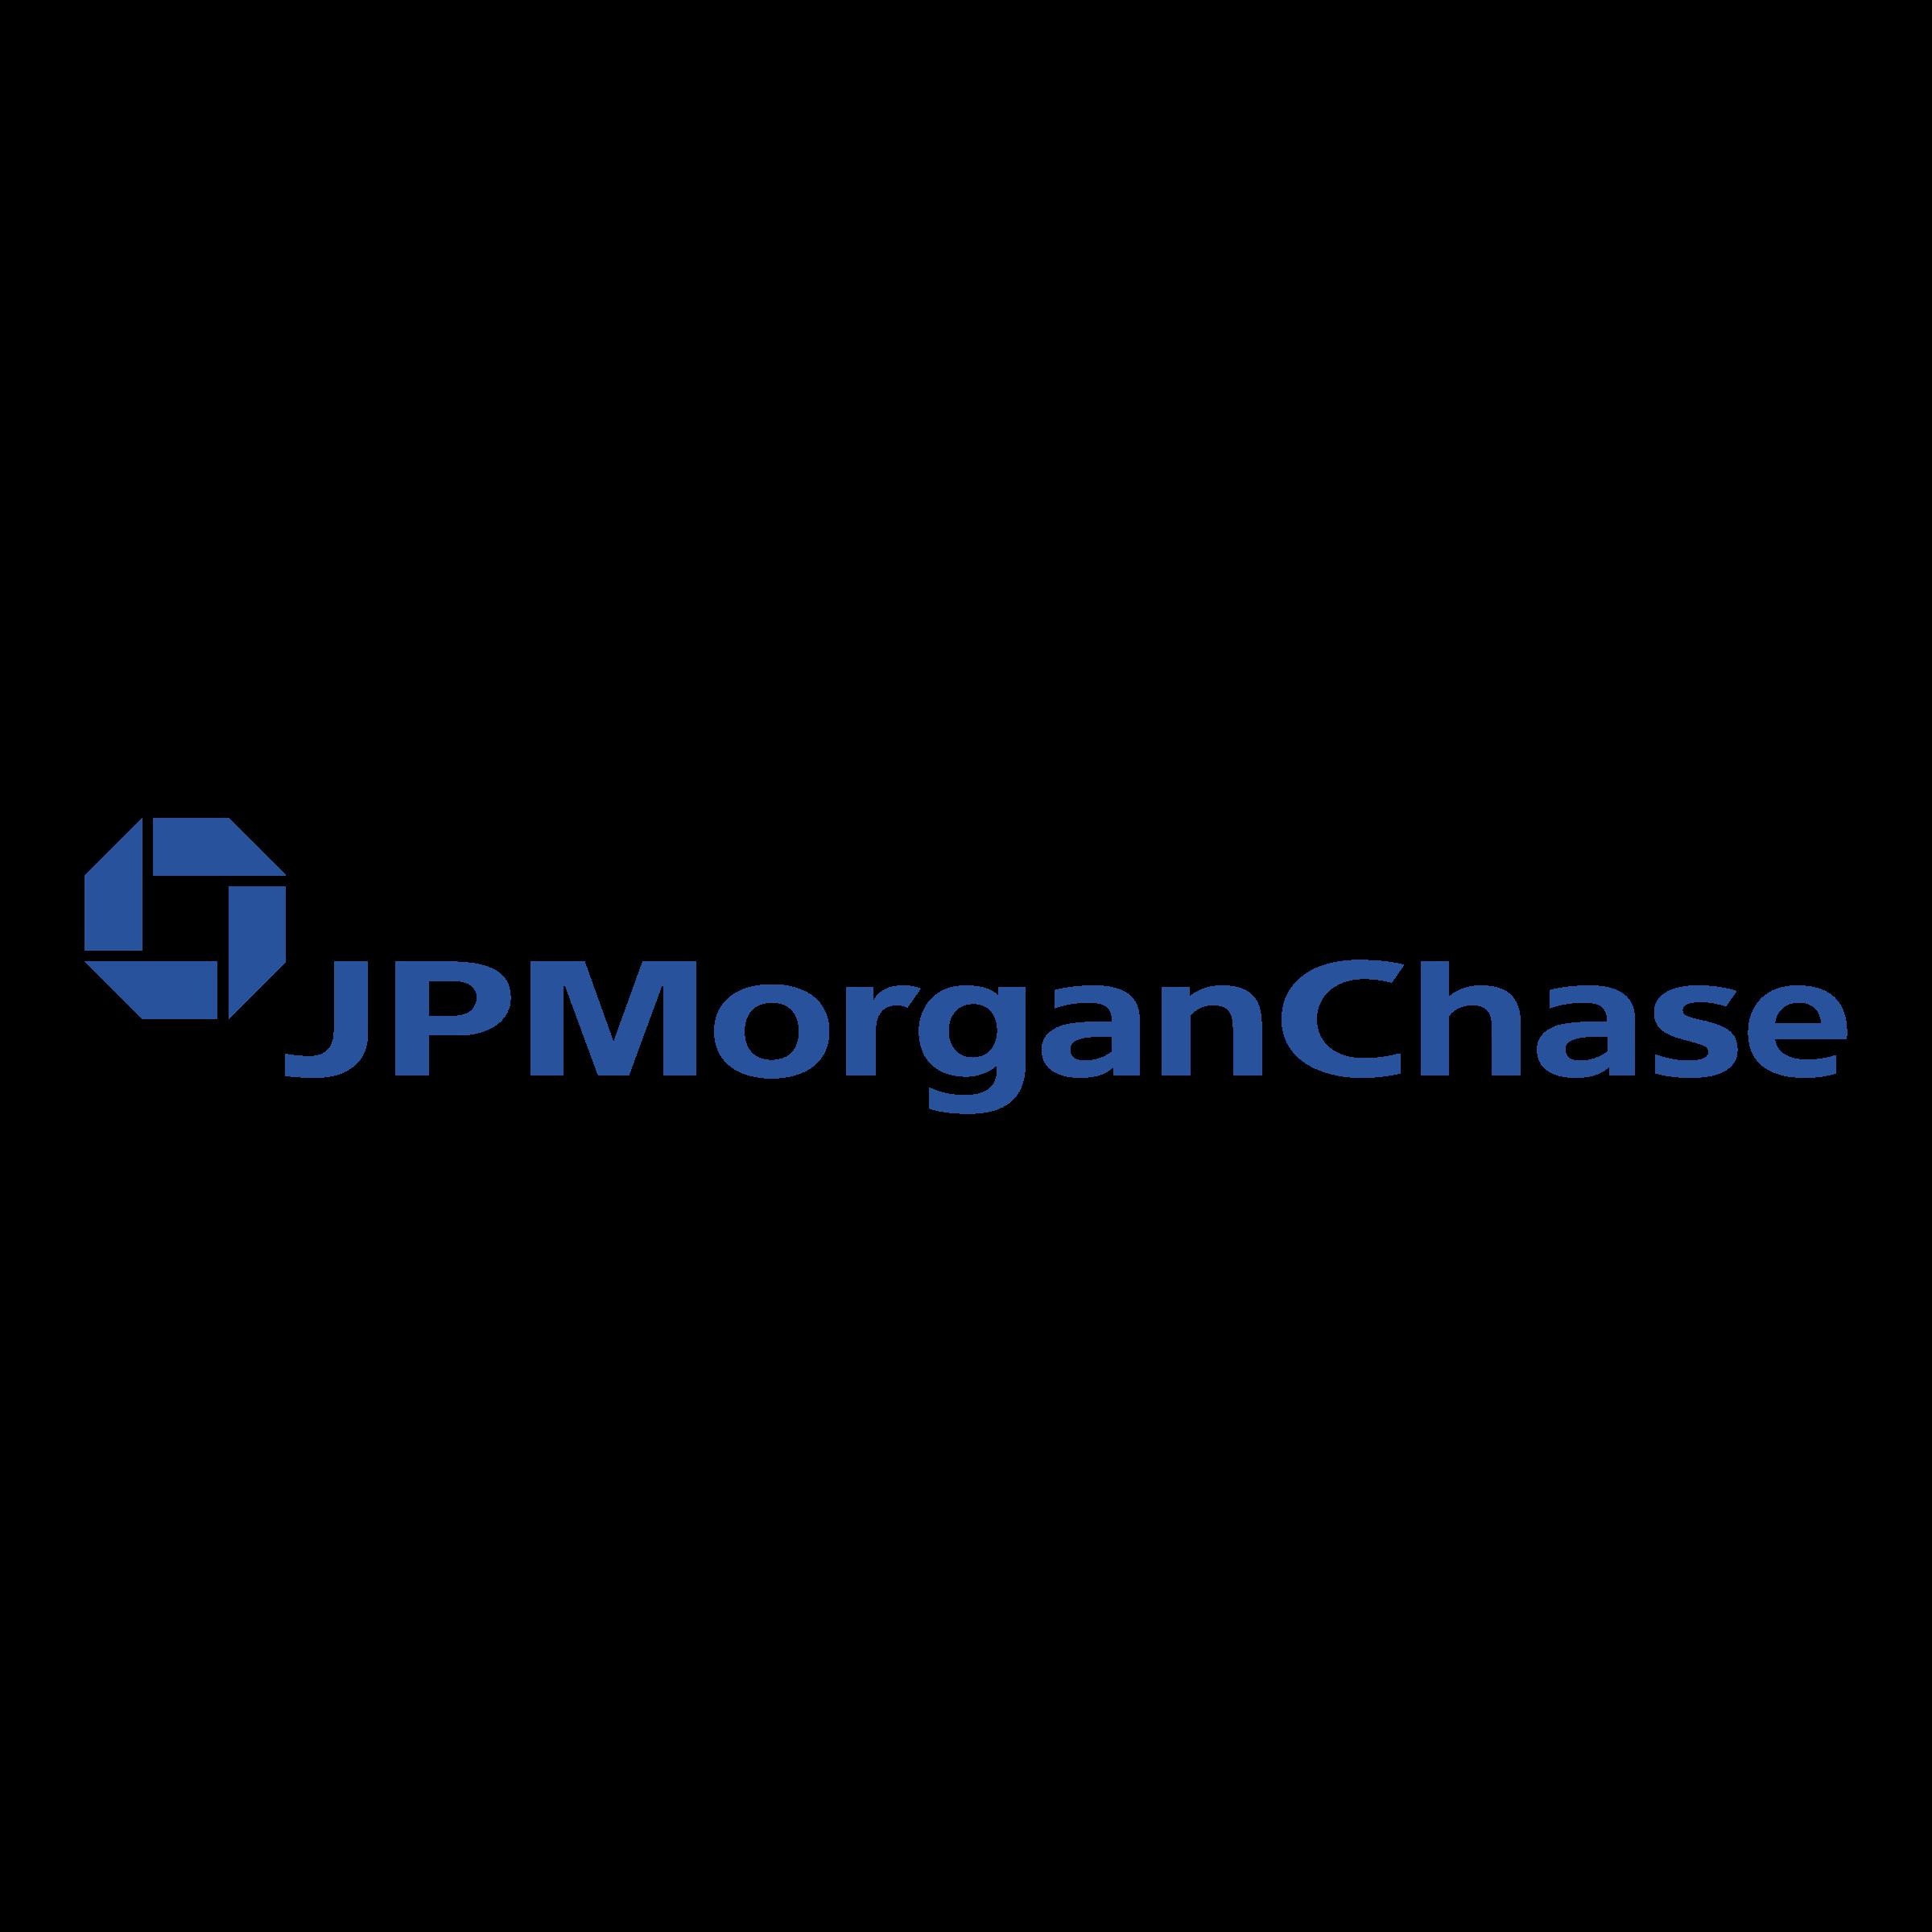 Jpmorgan Chase Logo Png Transparent Amp Svg Vector Freebie